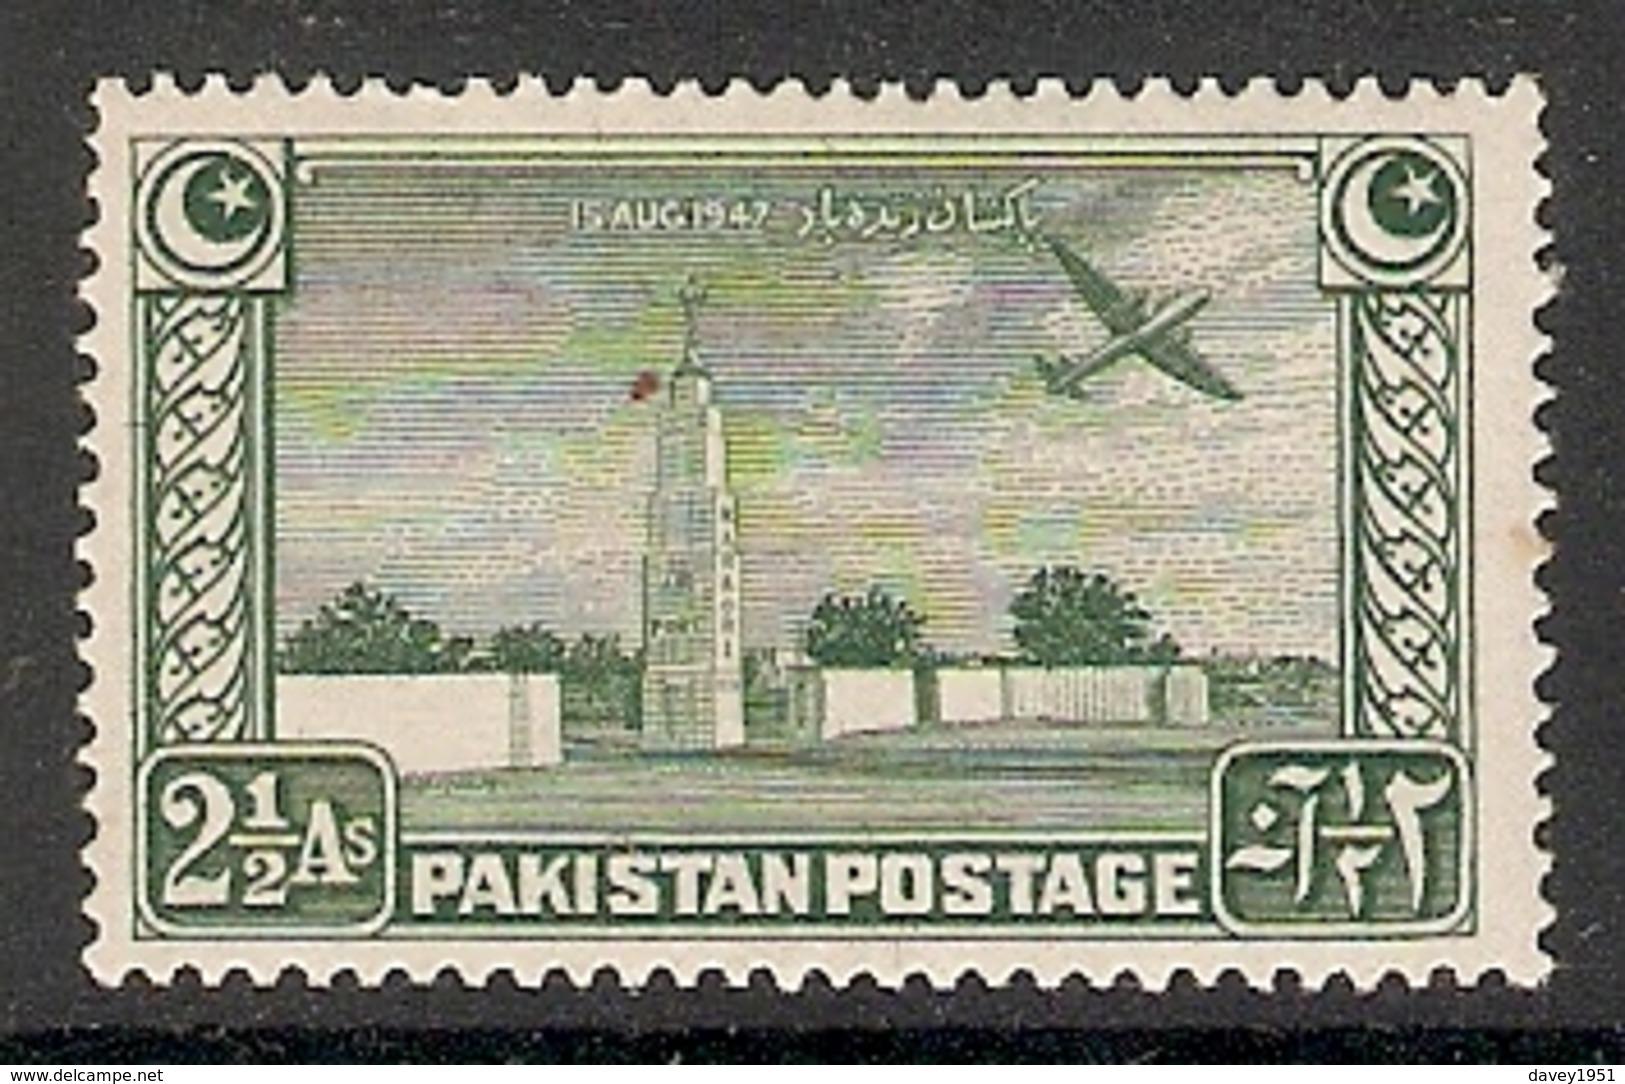 002403 Pakistan 1948 2 1/2 Annas MNH - Pakistan